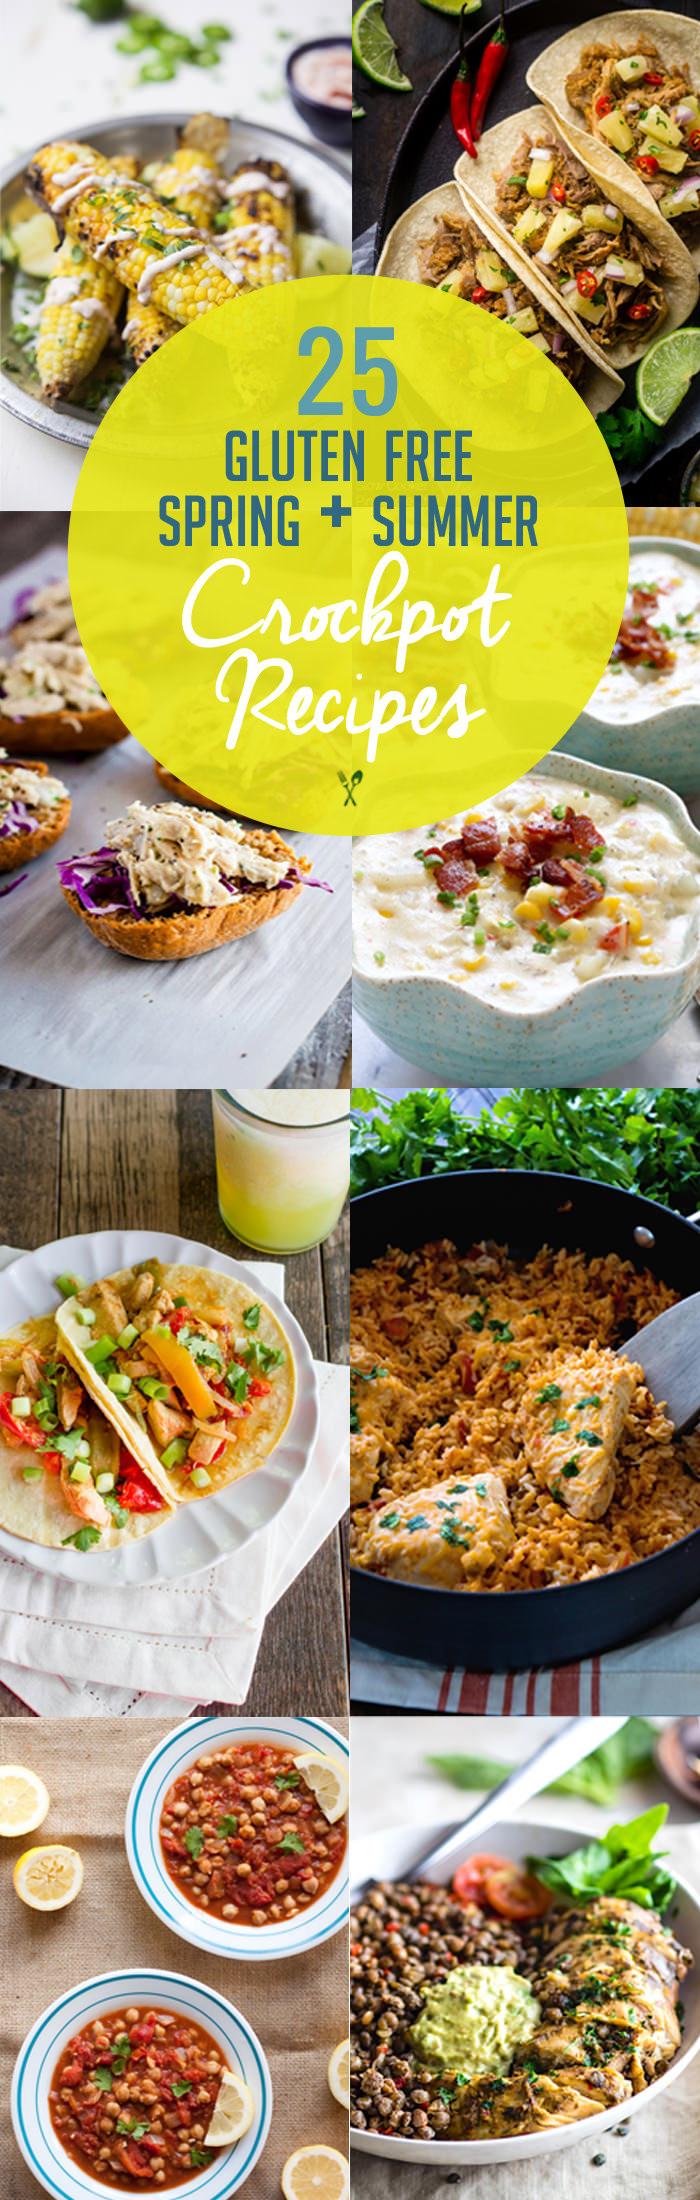 Gluten Free Summer Recipes  25 Spring and Summer Gluten Free Crock Pot Recipes